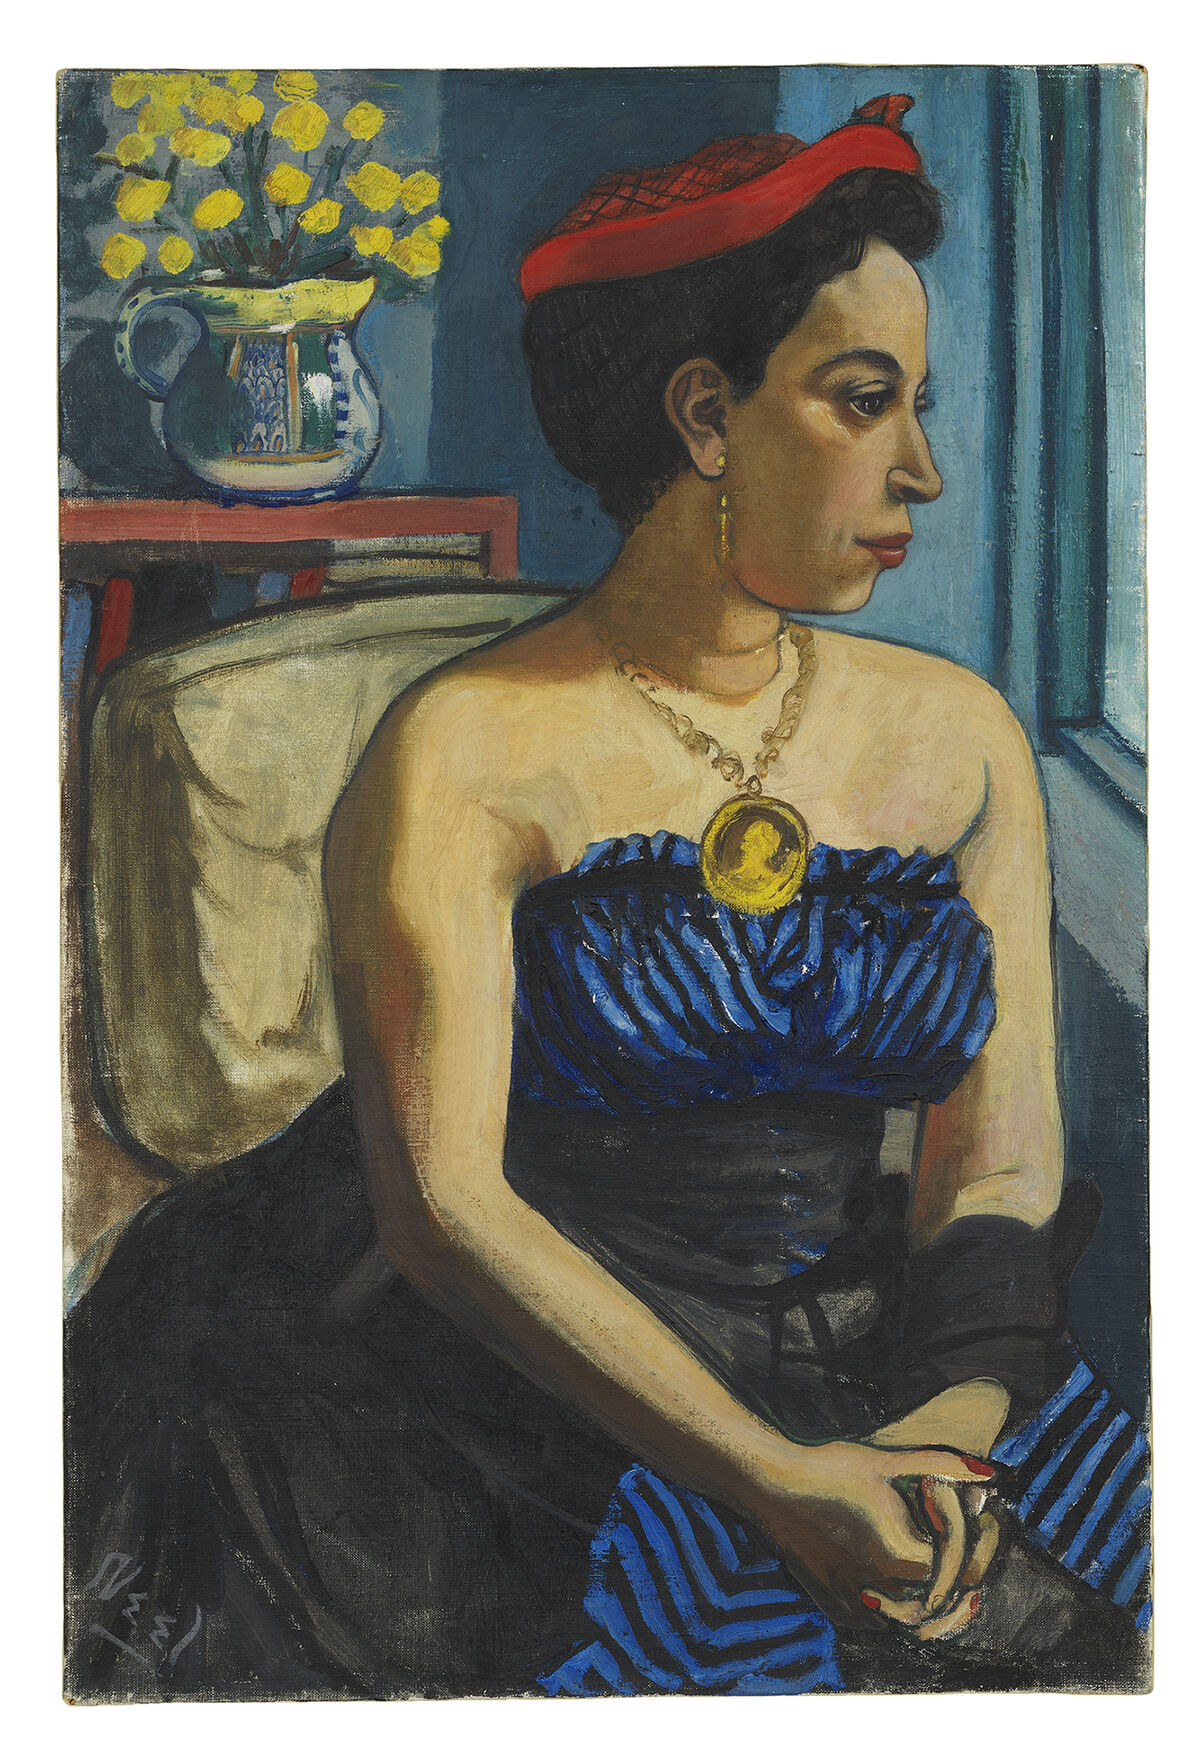 Alice Neel, Alice Childress, 1950.Collection of Art Berliner. © The Estate of Alice Neel. Courtesy David Zwirner, New York/London and Victoria Miro, London.